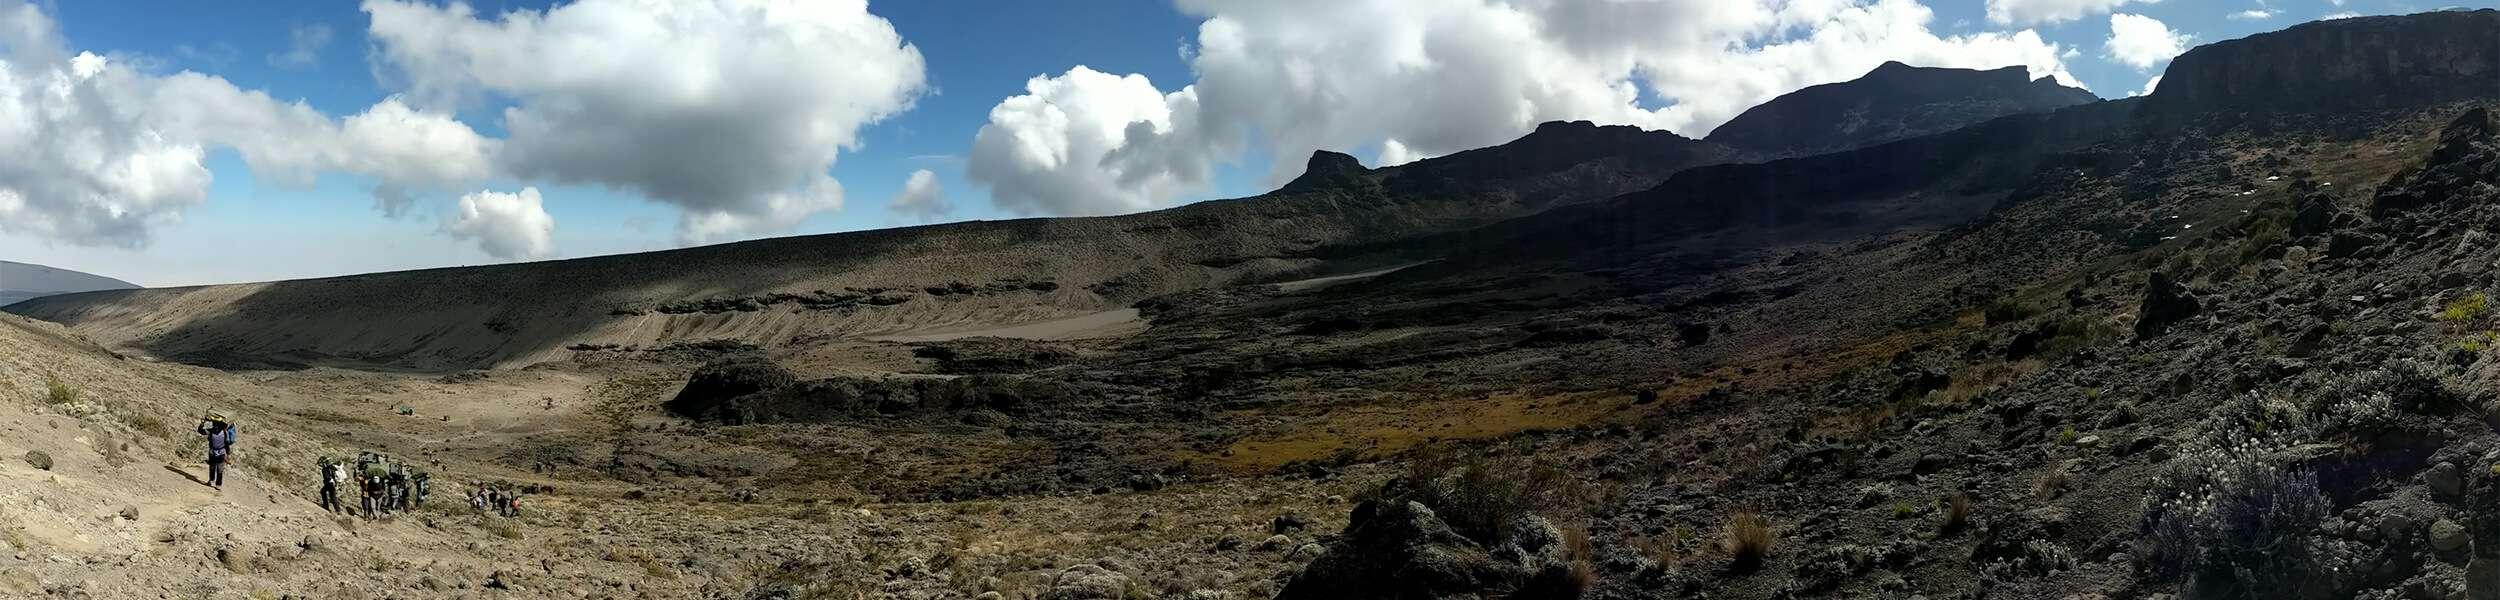 Kilimanjaro_panorama